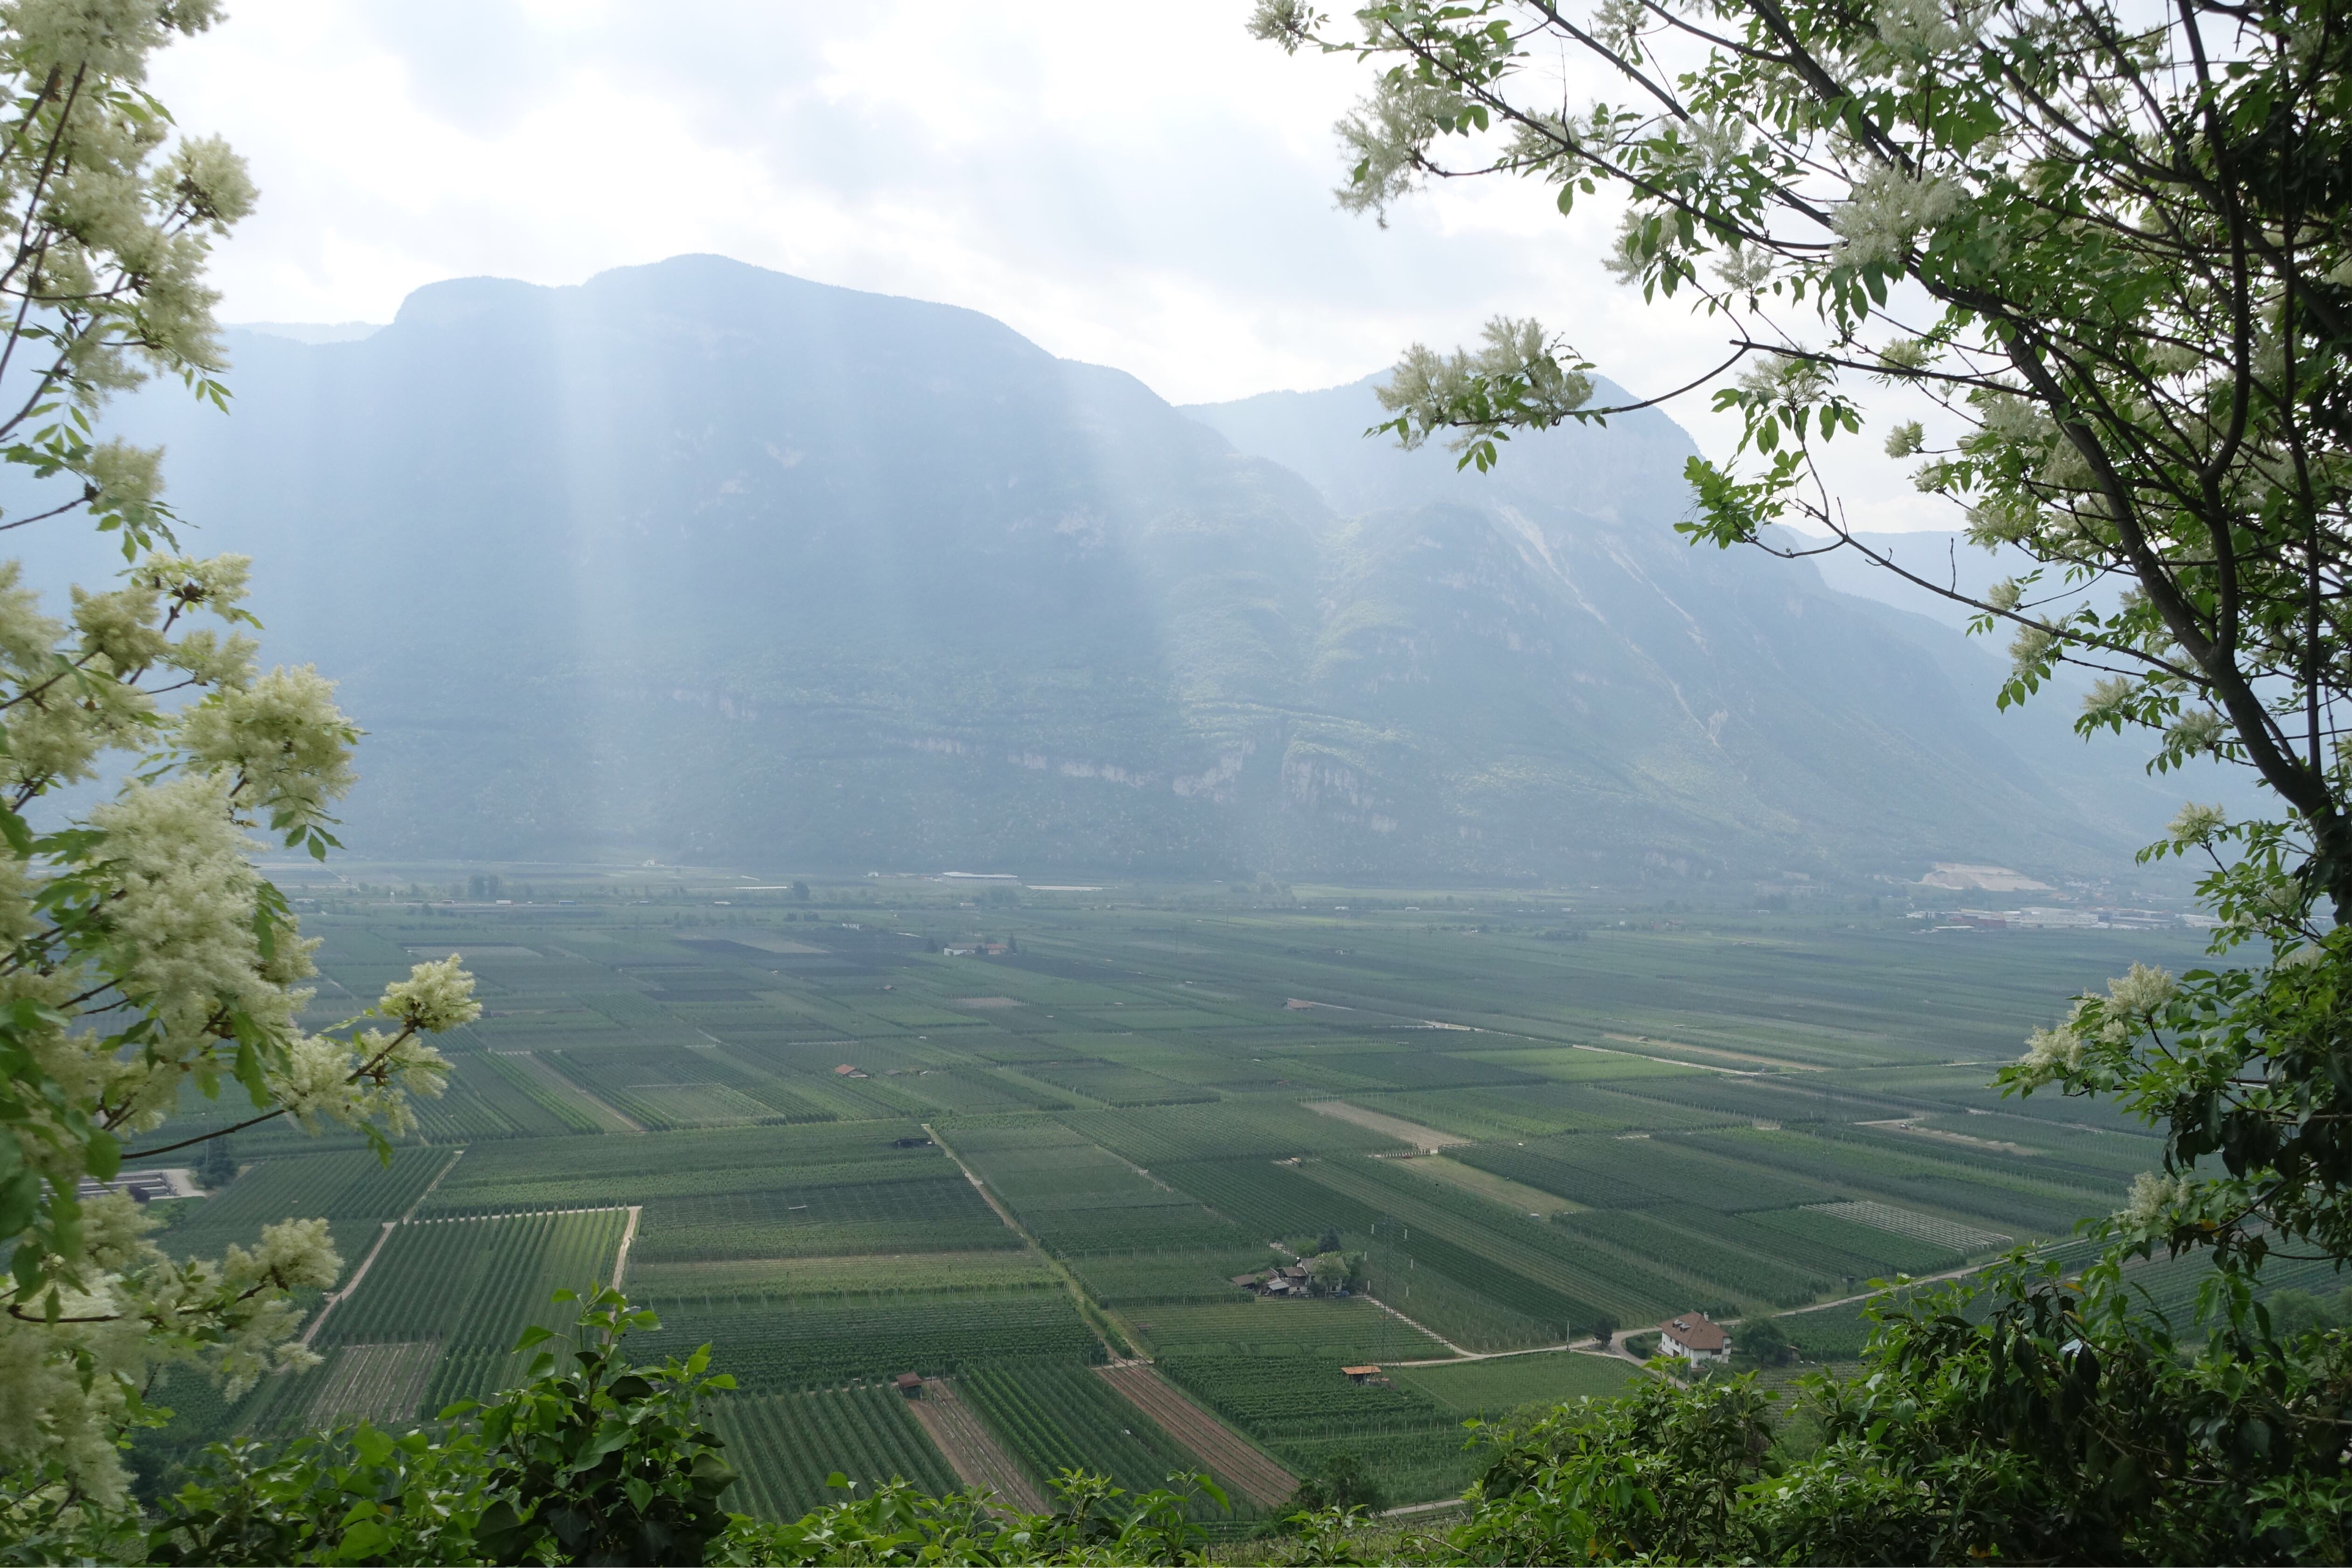 Via Romea Germanica Alto Adige